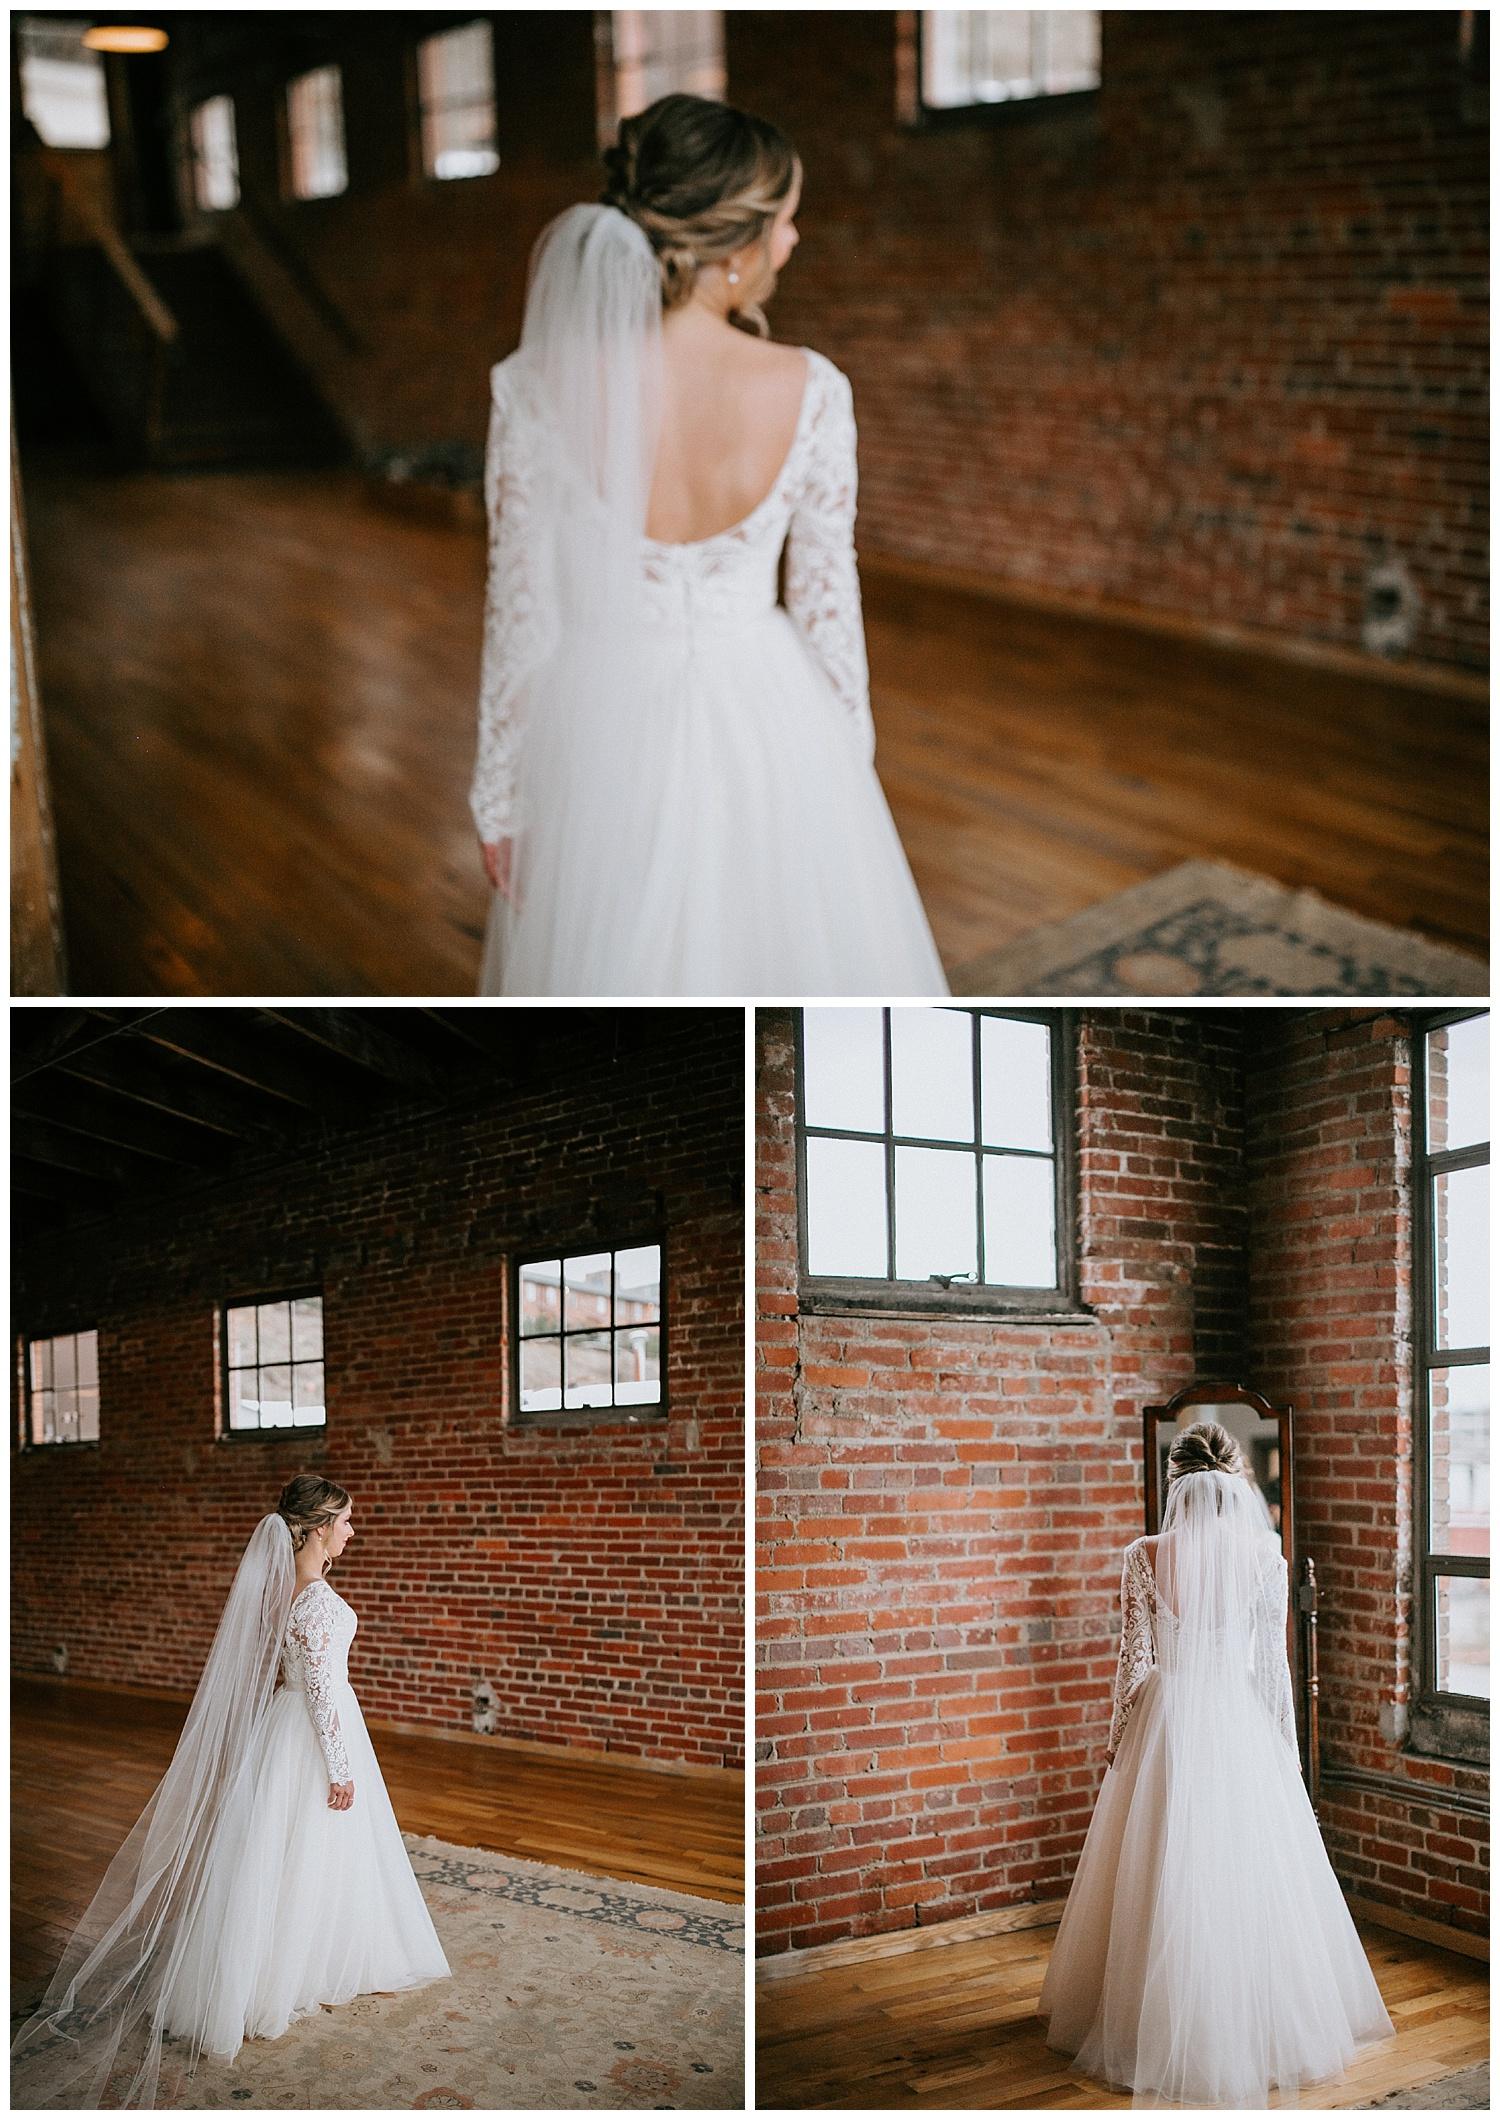 winter-wedding-the standard-knoxville_2019-01-23_0012.jpg